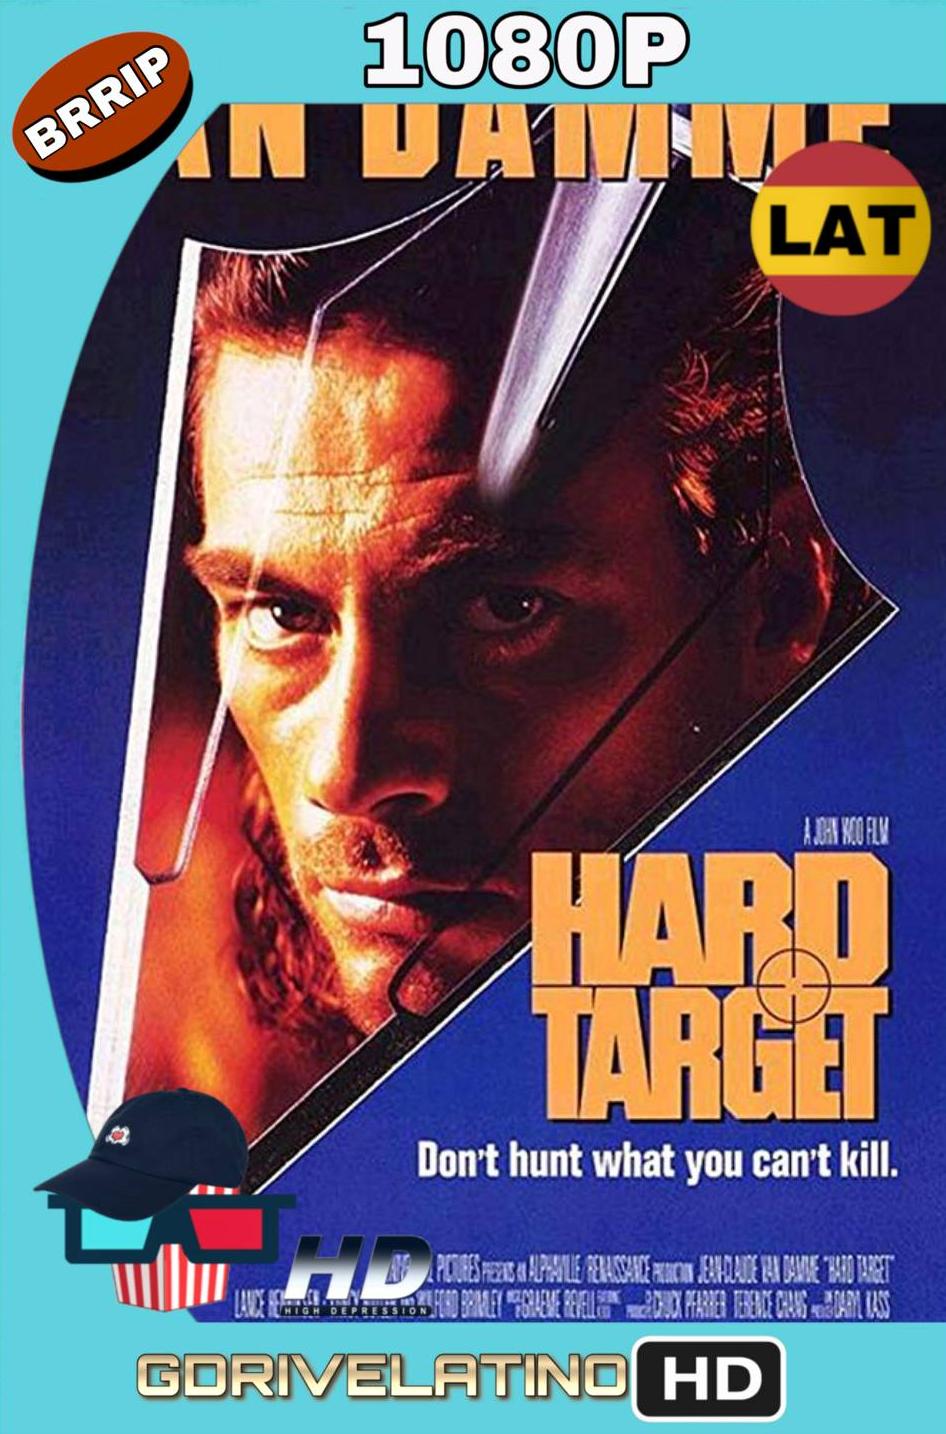 Operación Cacería (1993) BRRip 1080p (Latino) MKV